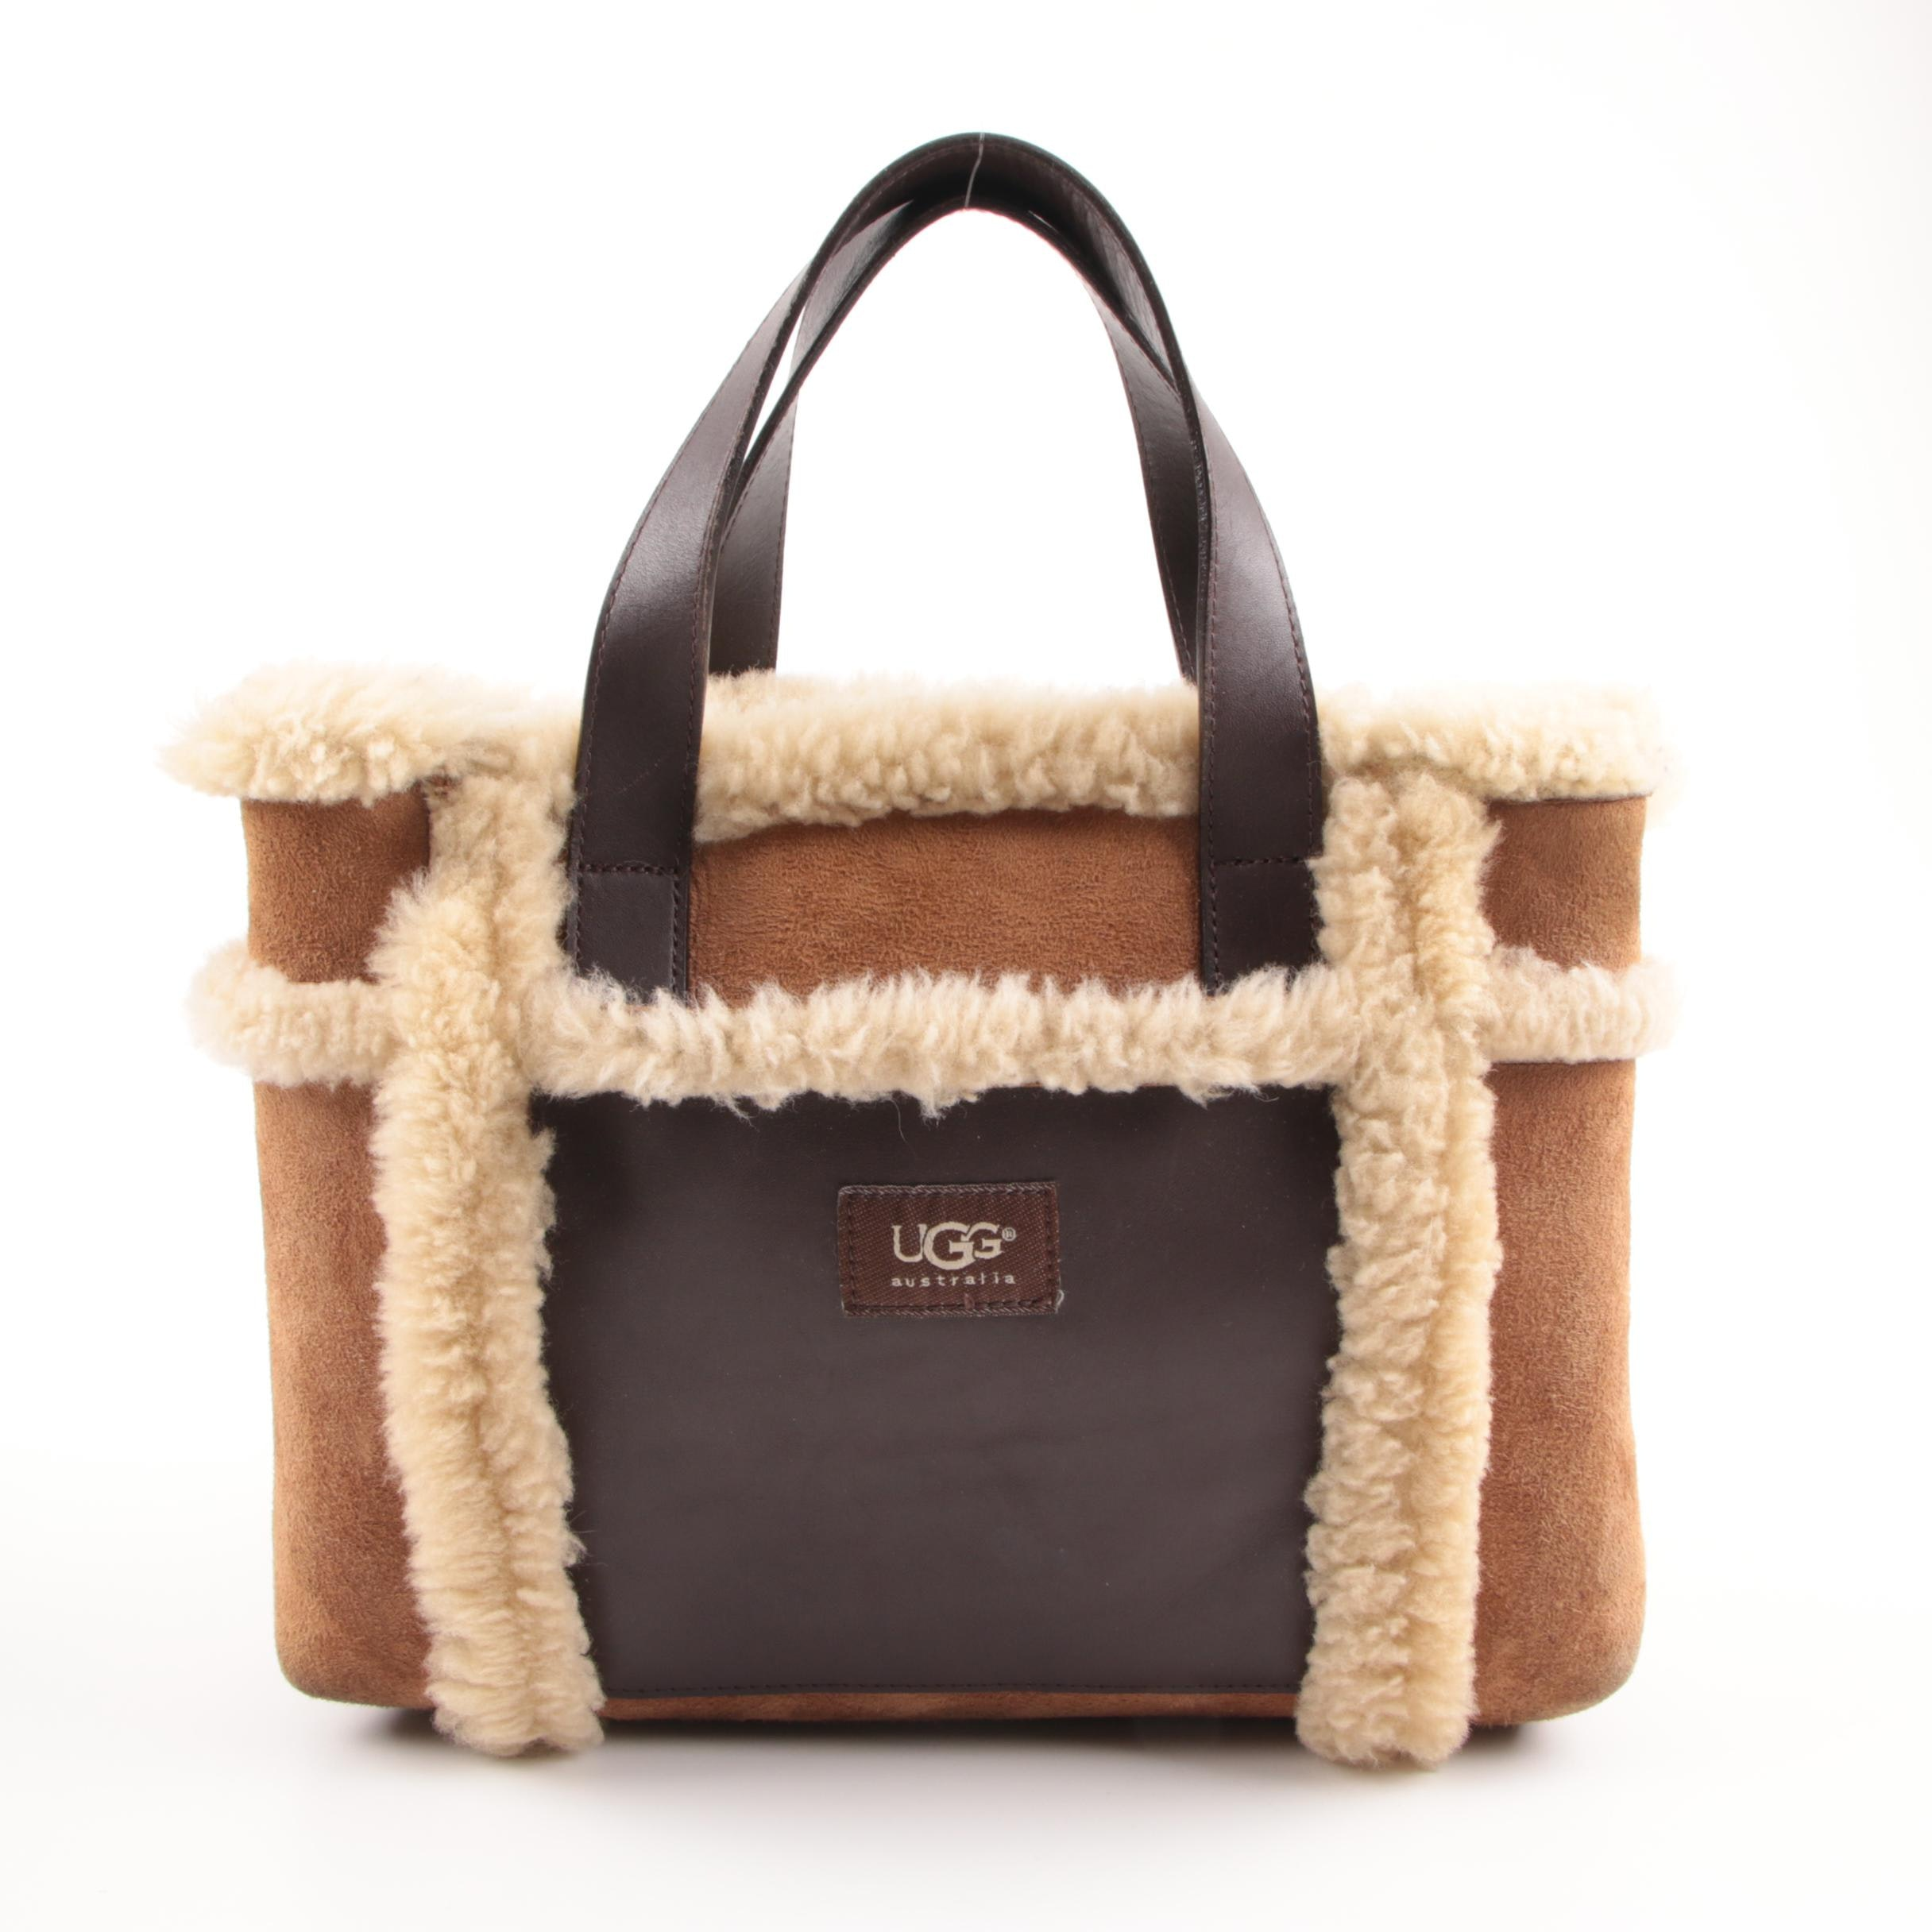 UGG Australia Sundance Sheepskin Handbag